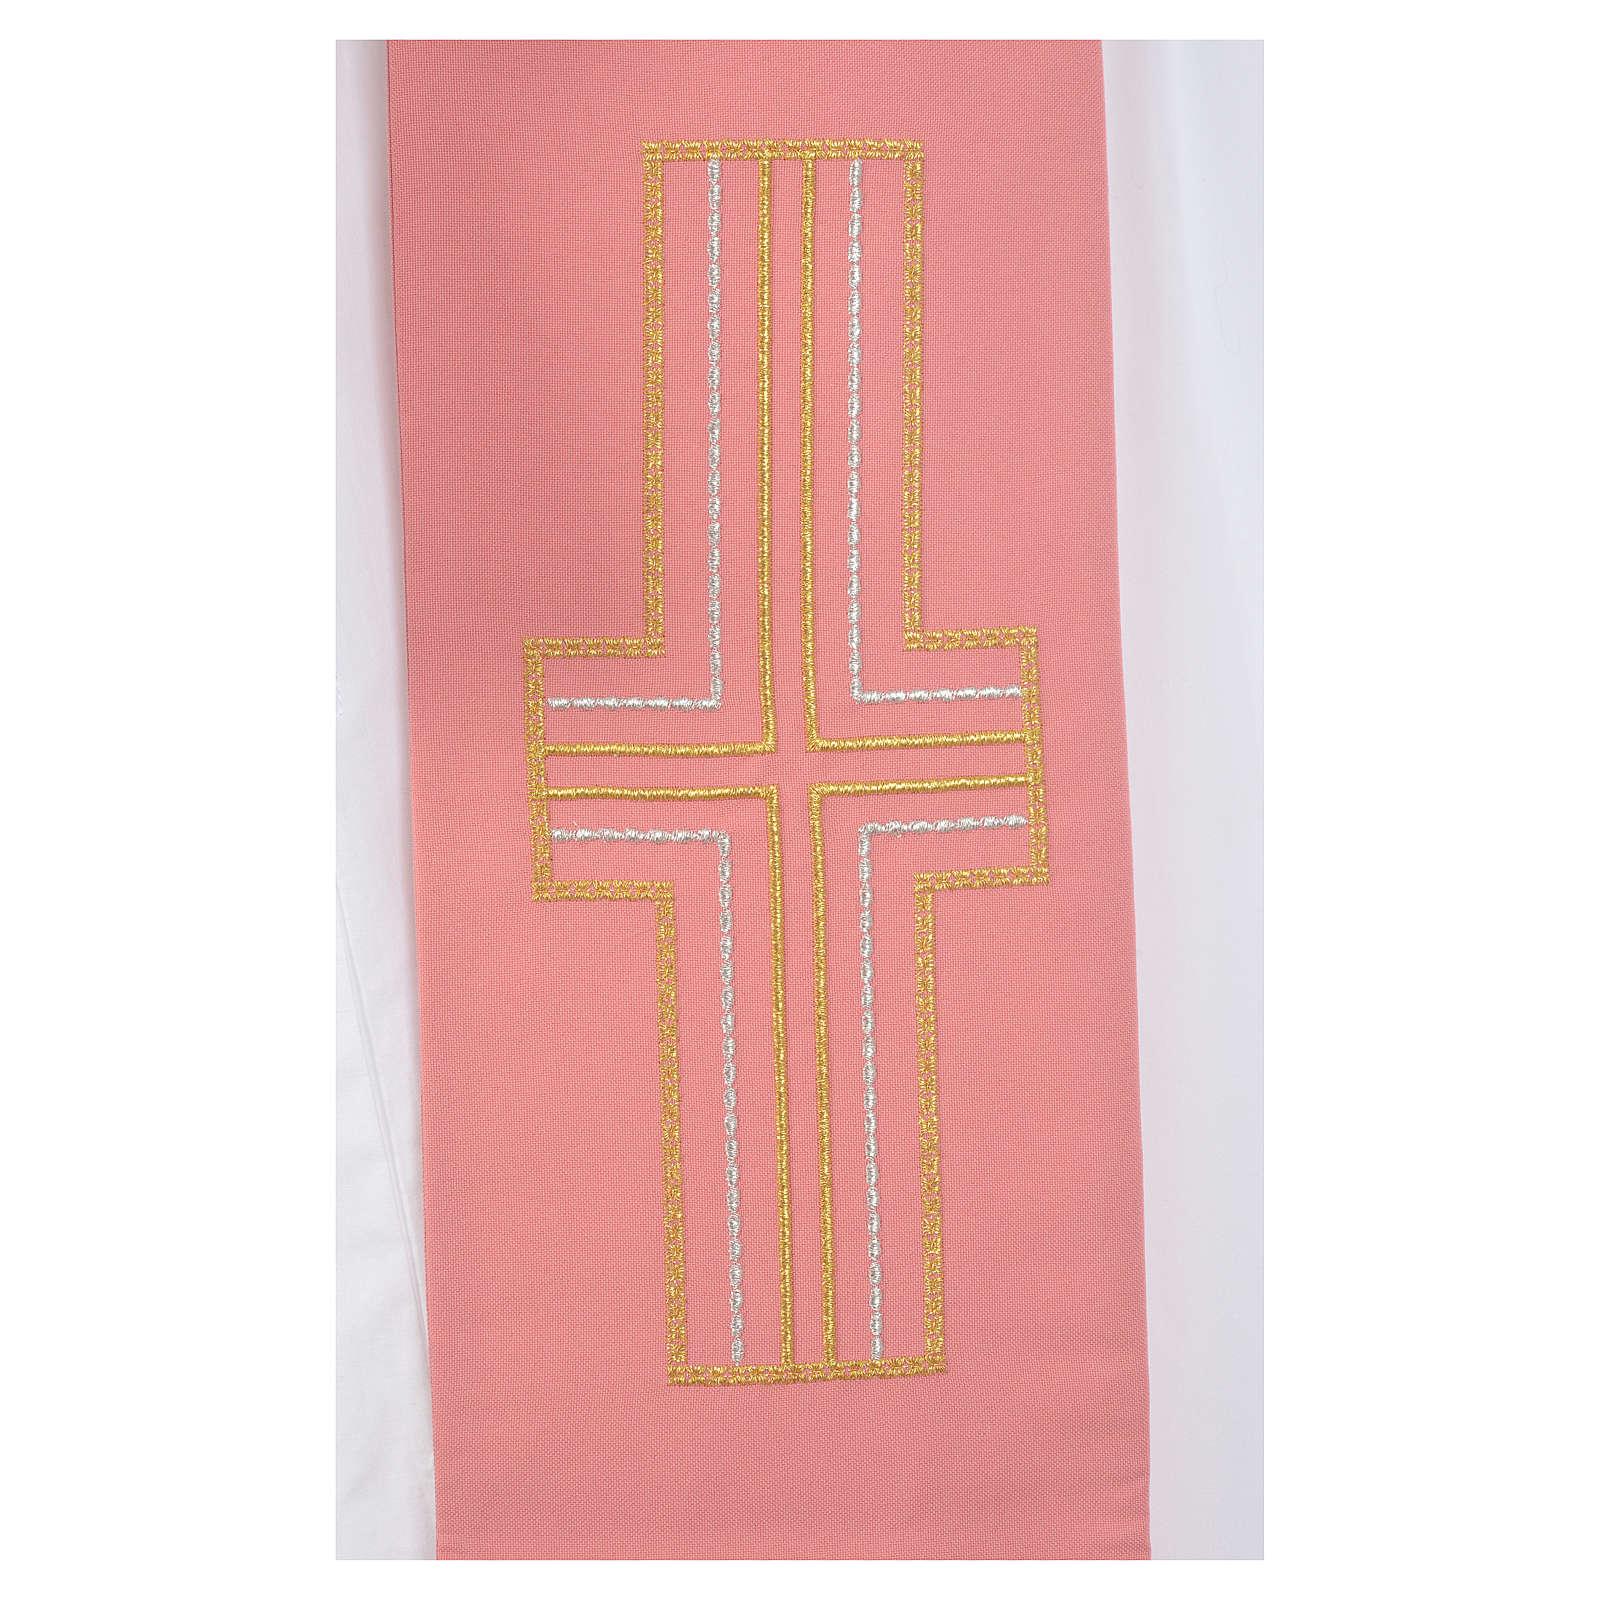 Estola diaconal rosa 100% poliéster alfa y omega 4